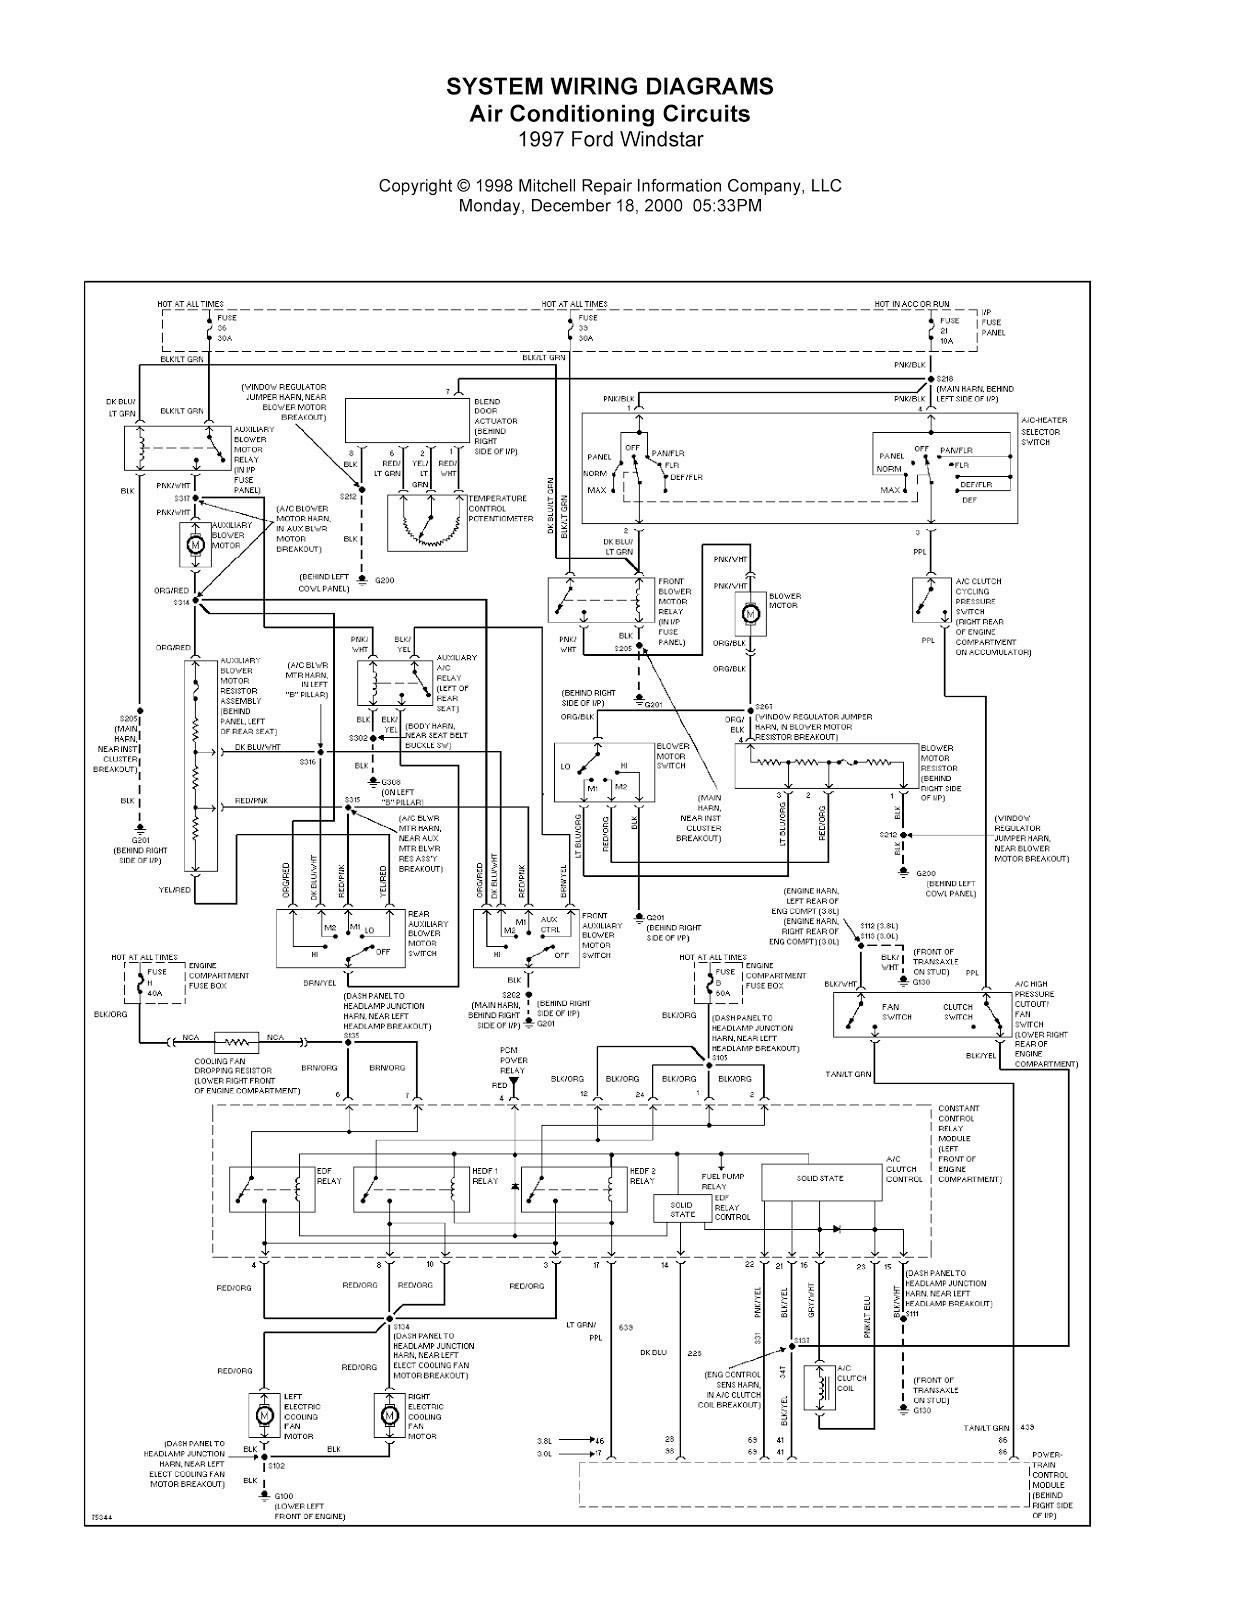 1996 Ford Windstar Engine Diagram